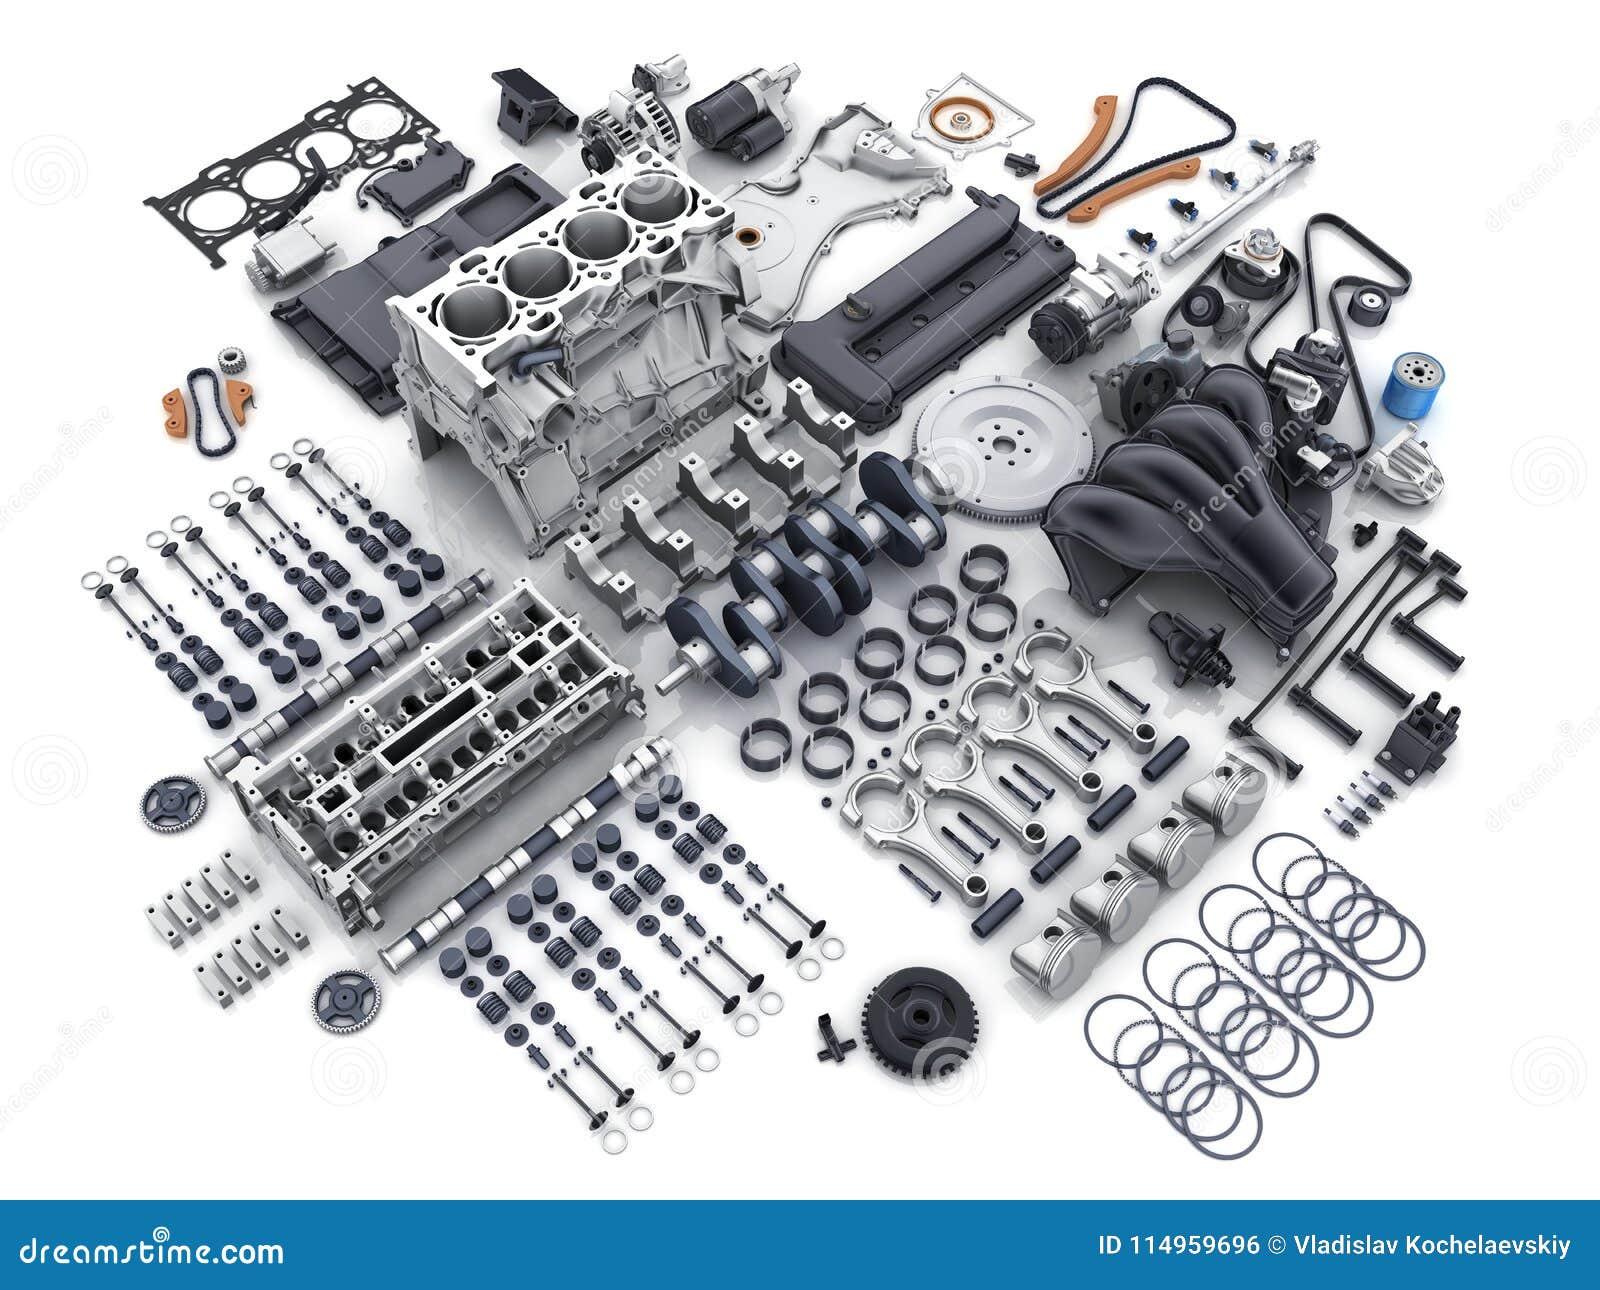 Car Engine Disassembled Many Parts Stock Illustration